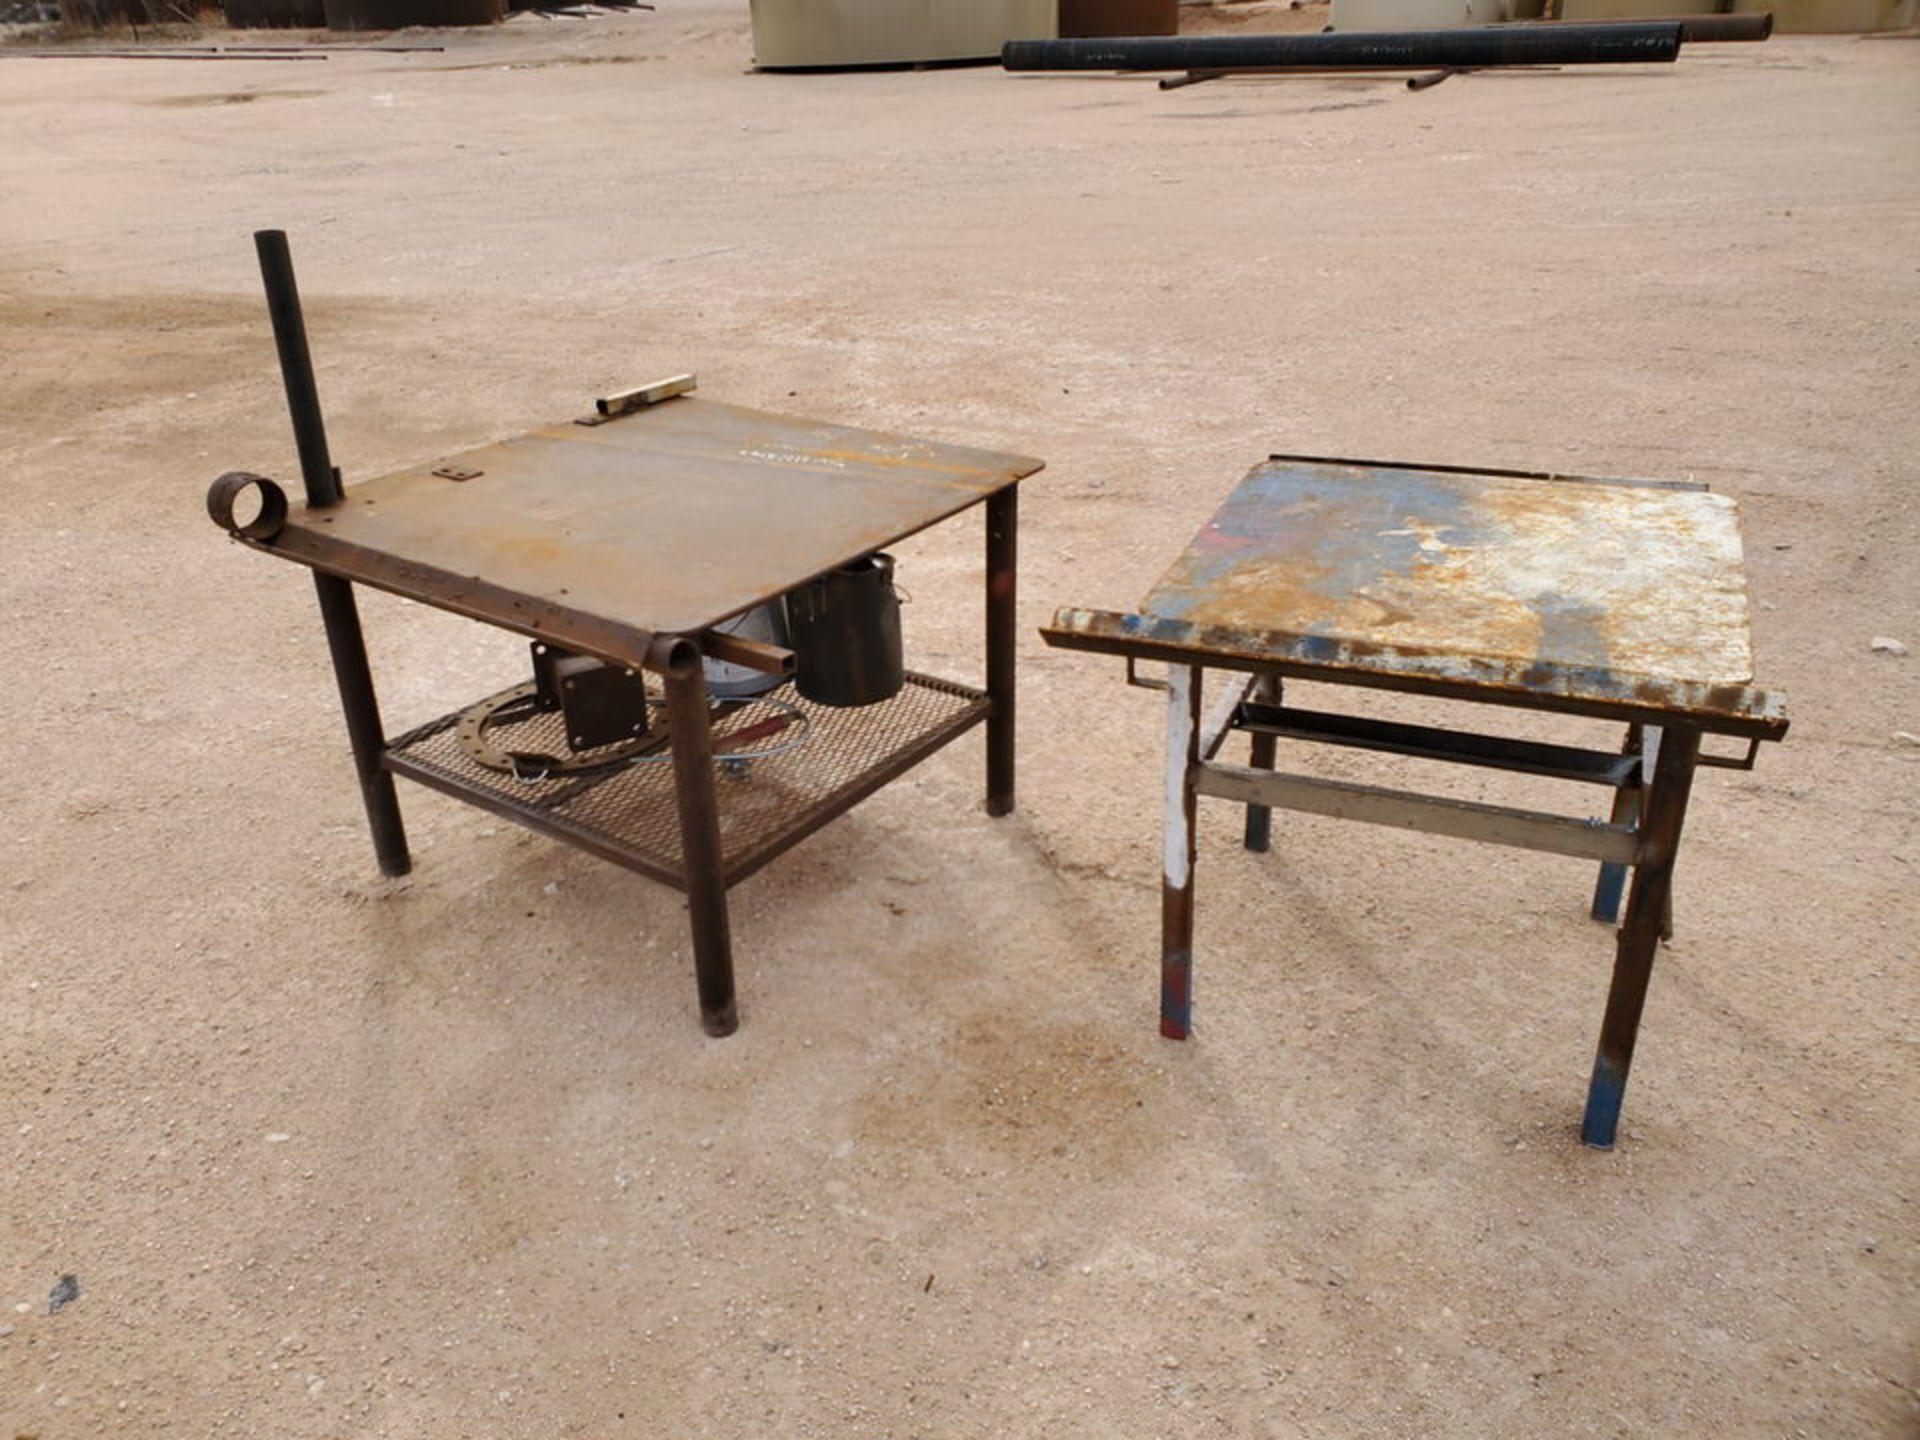 "(2) Stl Welding Tables (1) 43"" x 48"" x 36"", (1) 39"" x 36"" x 36"" - Image 4 of 5"